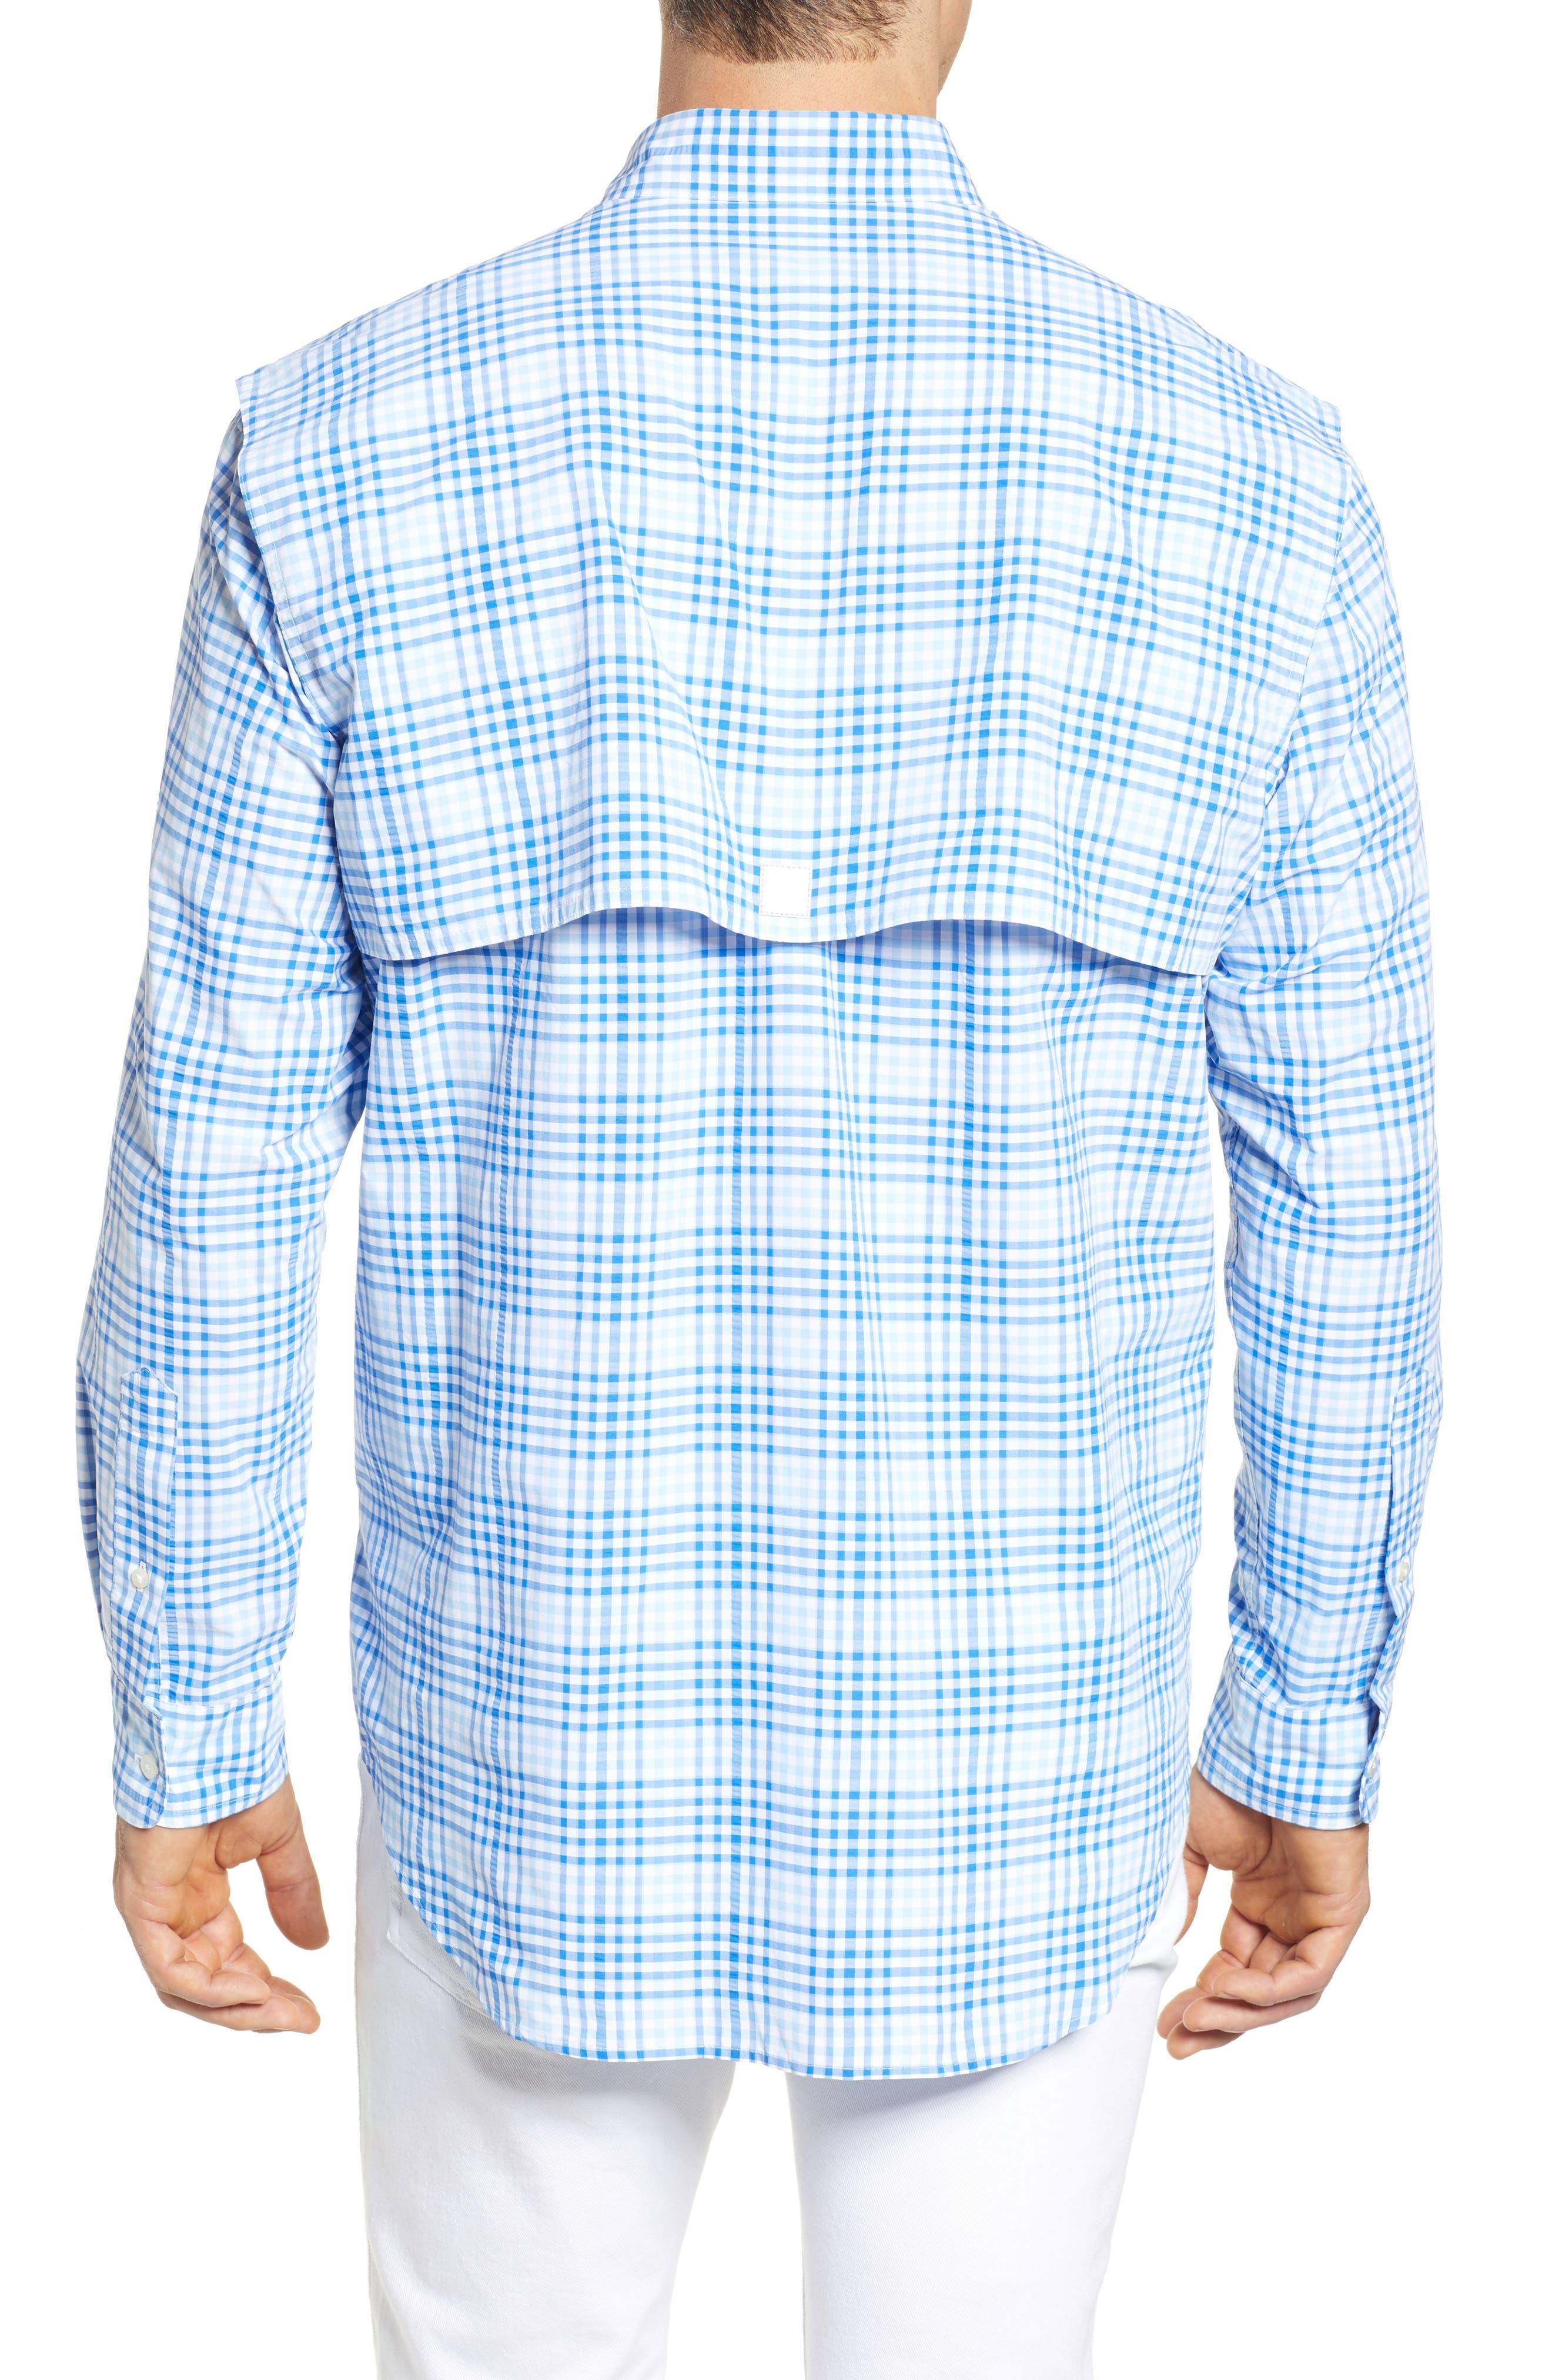 South Shore Harbor Regular Fit Plaid Performance Sport Shirt,                             Alternate thumbnail 3, color,                             Jake Blue